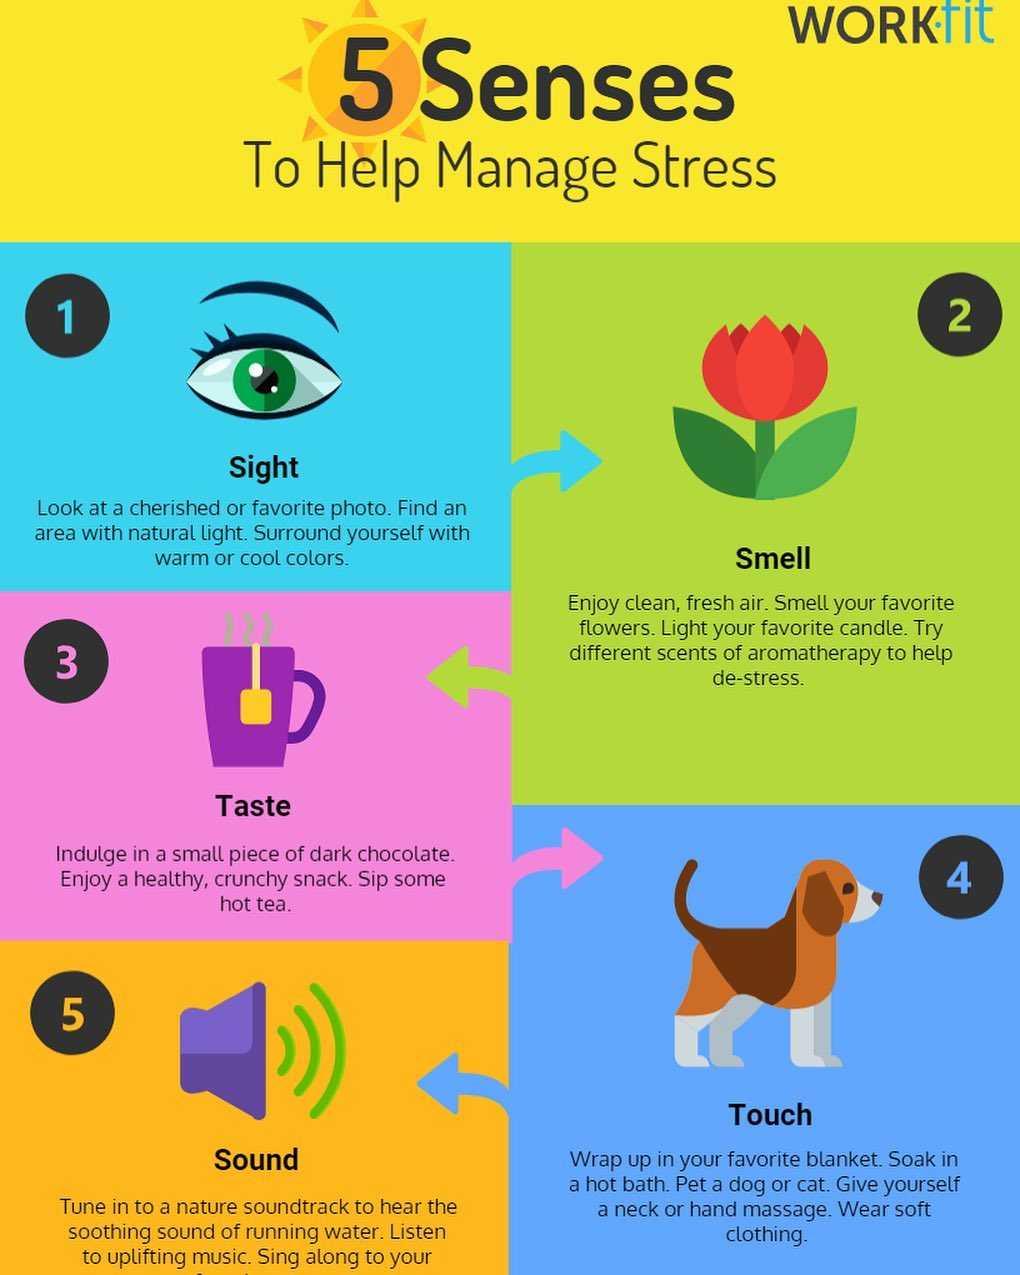 5 Senses To Help Manage Stress